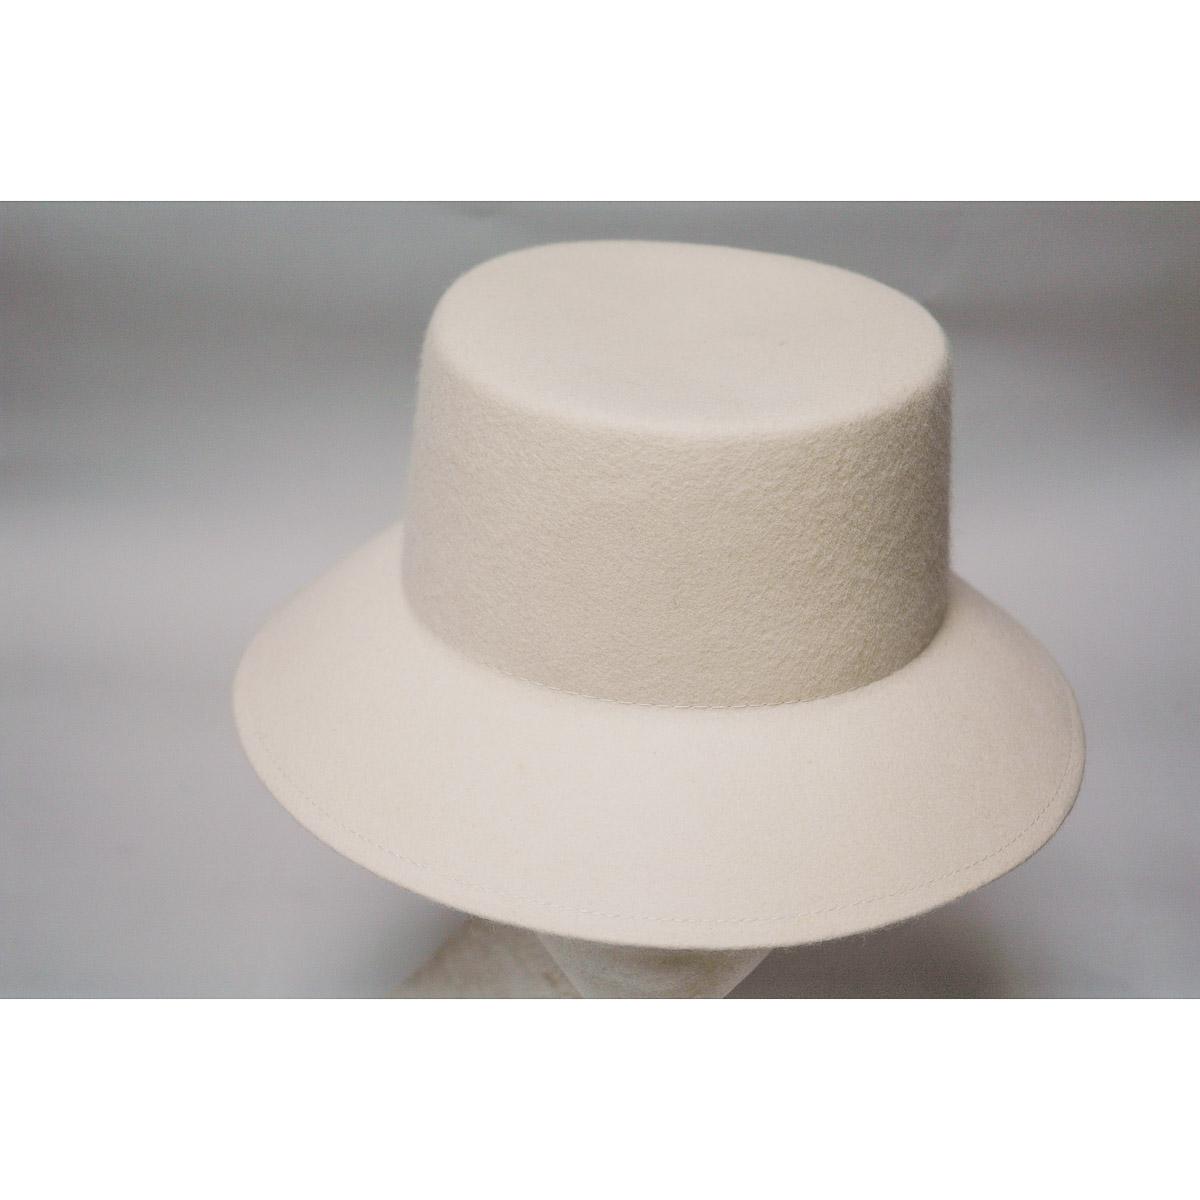 86d370f1aec6d Ivory Lampshade Small Brim Flat Top Blocked Untrimmed Felt Hat Base